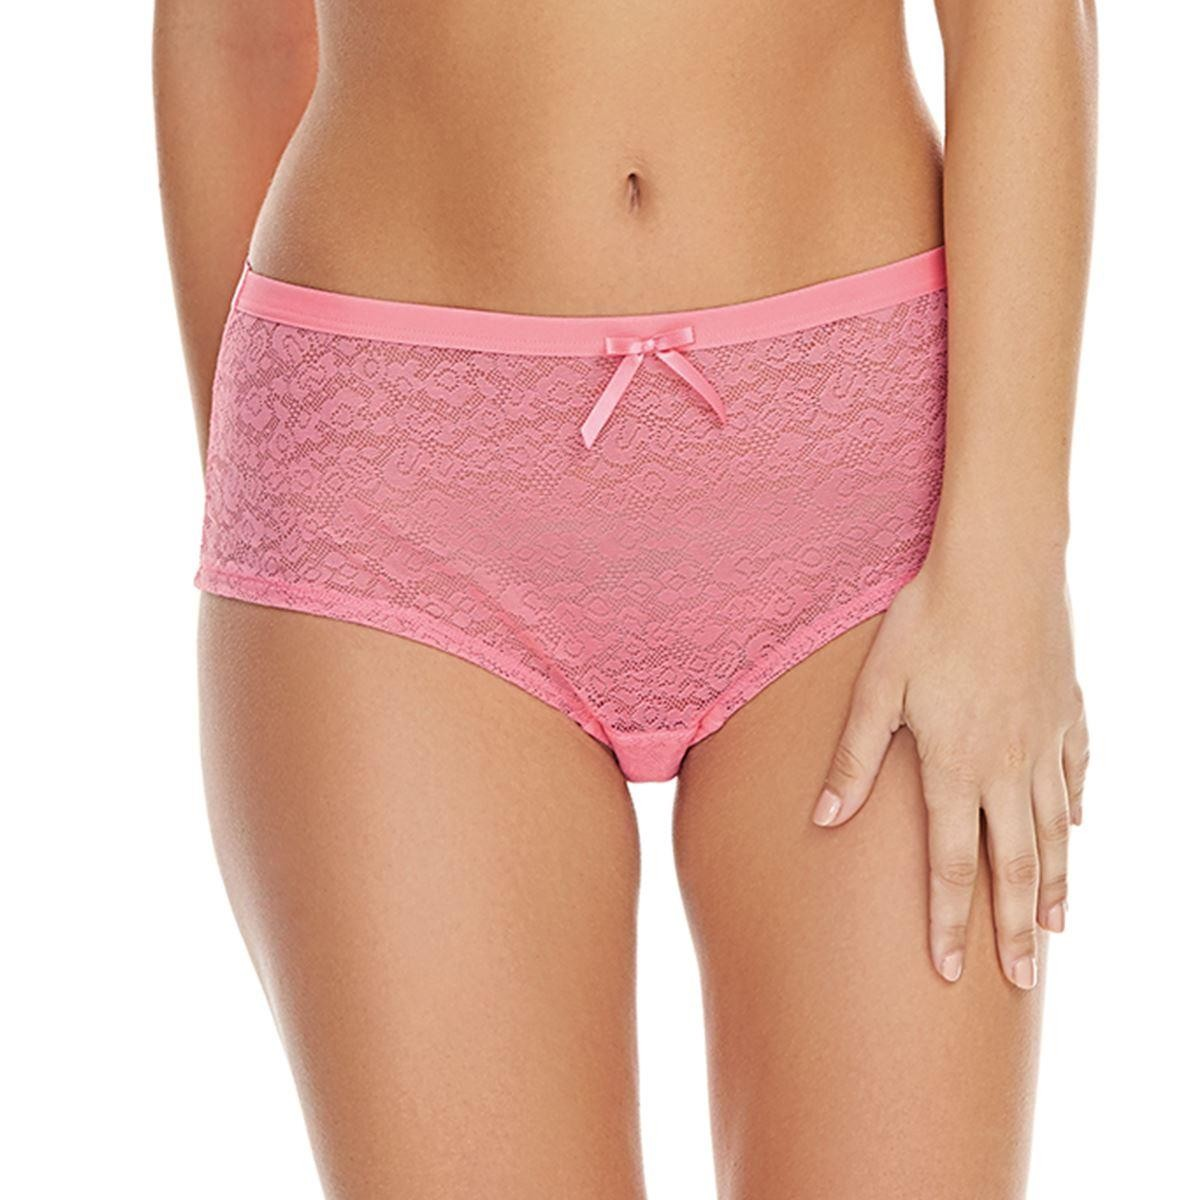 Freya Freya Fancies Hipster Short -  Candy Pink